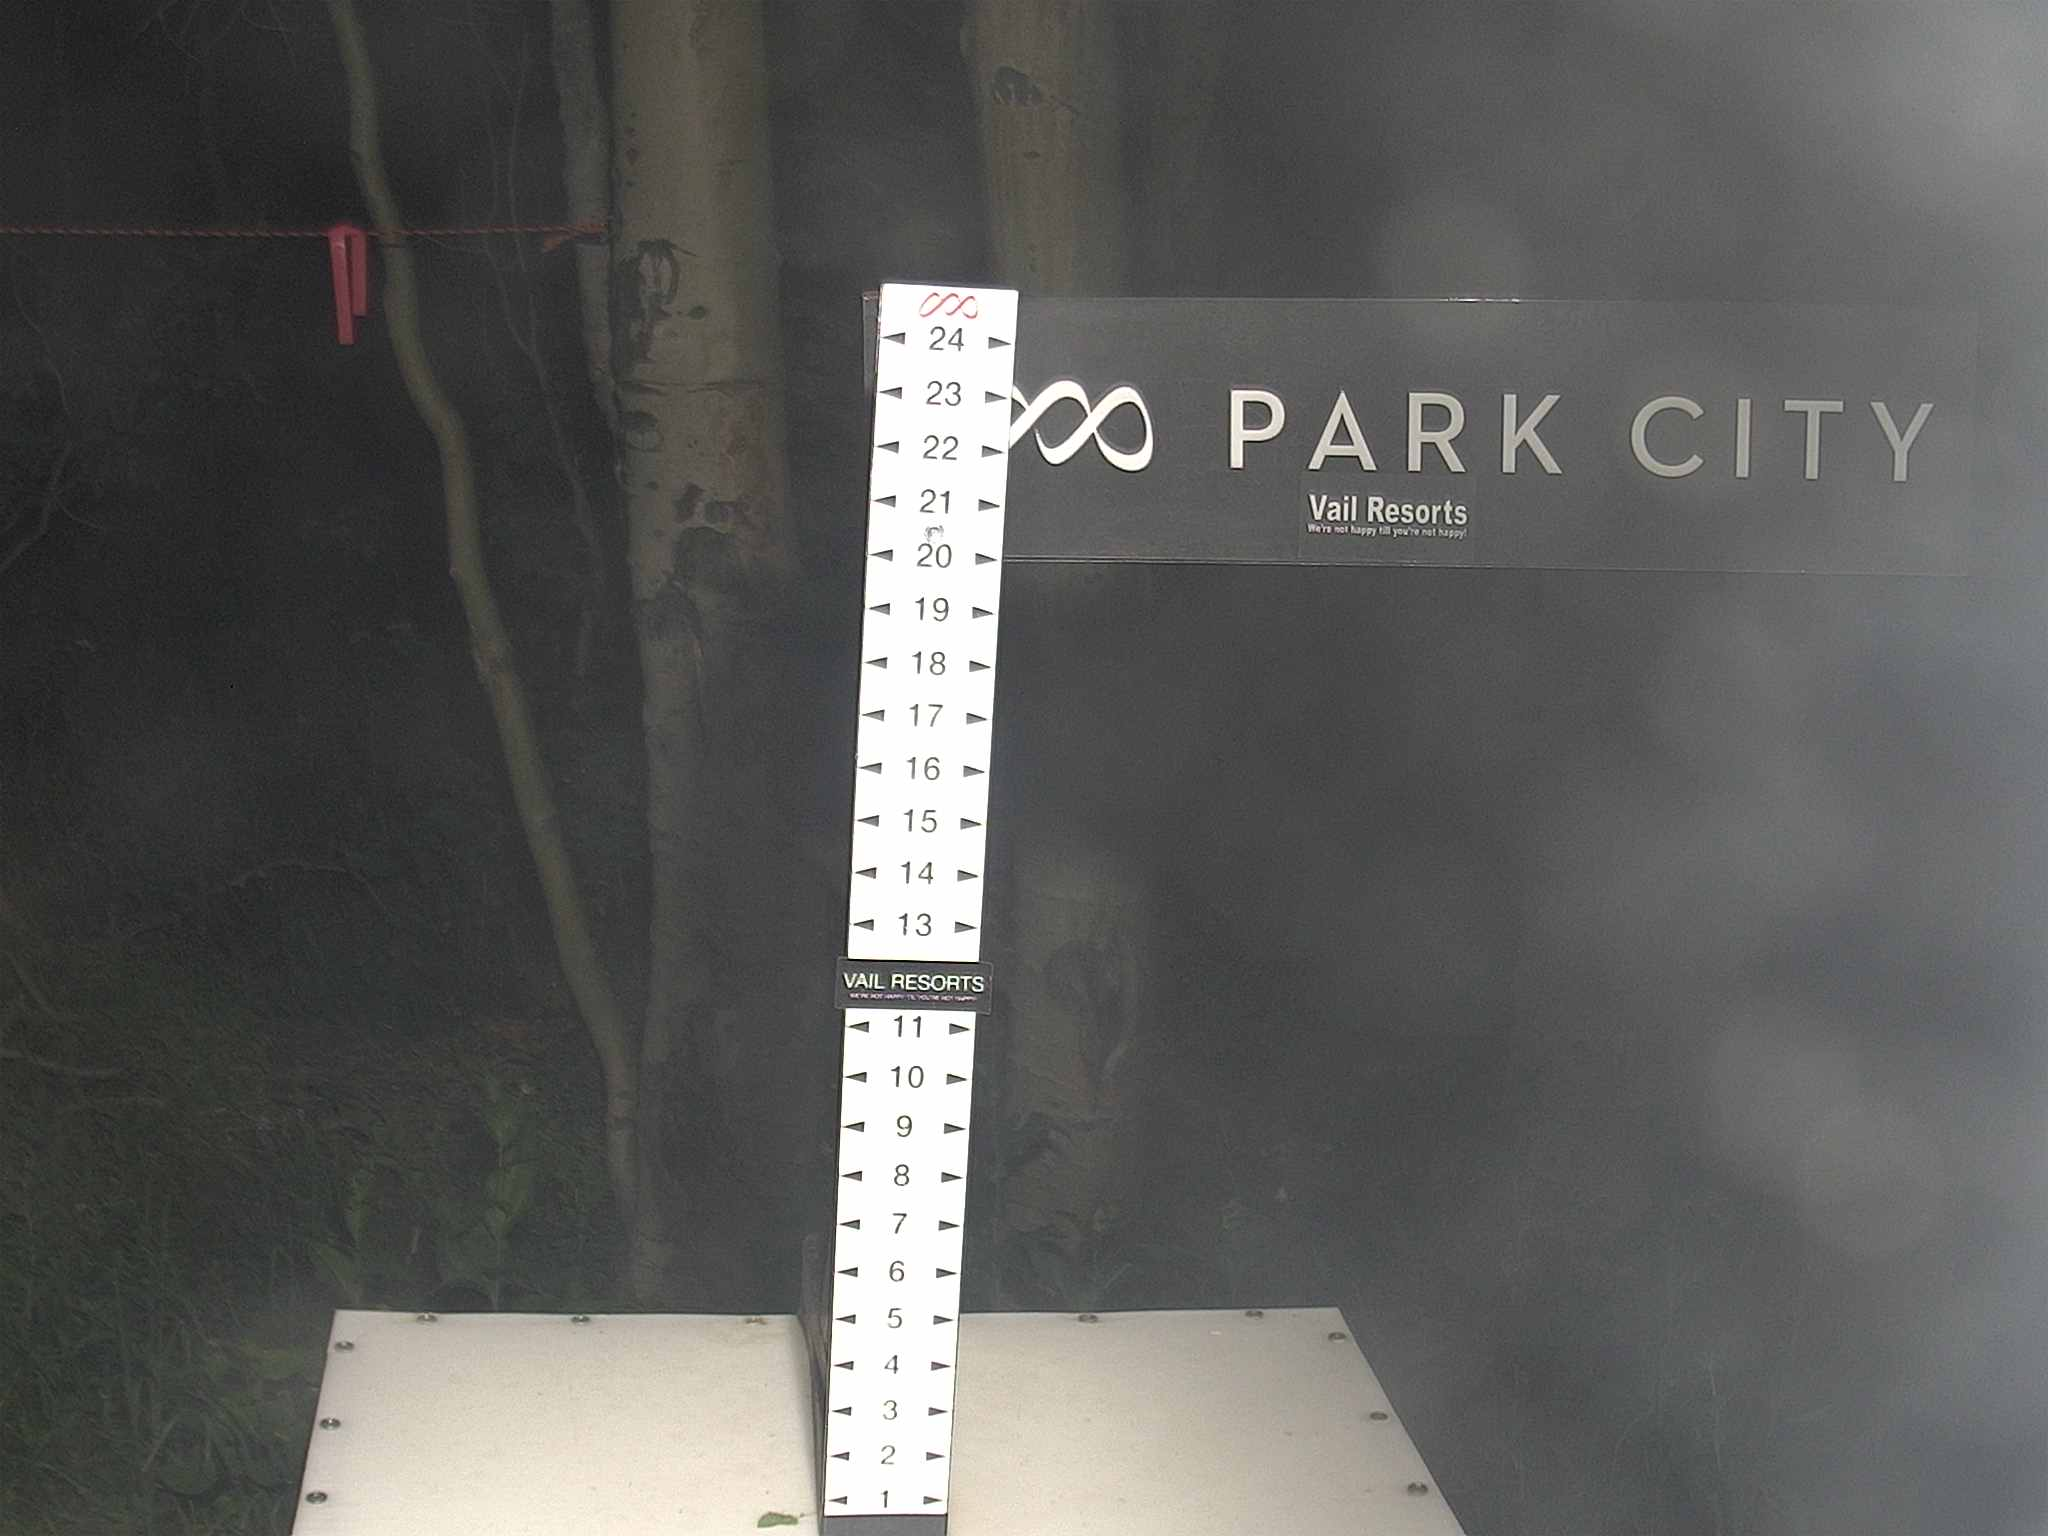 Park City Mountain Resort Webcam